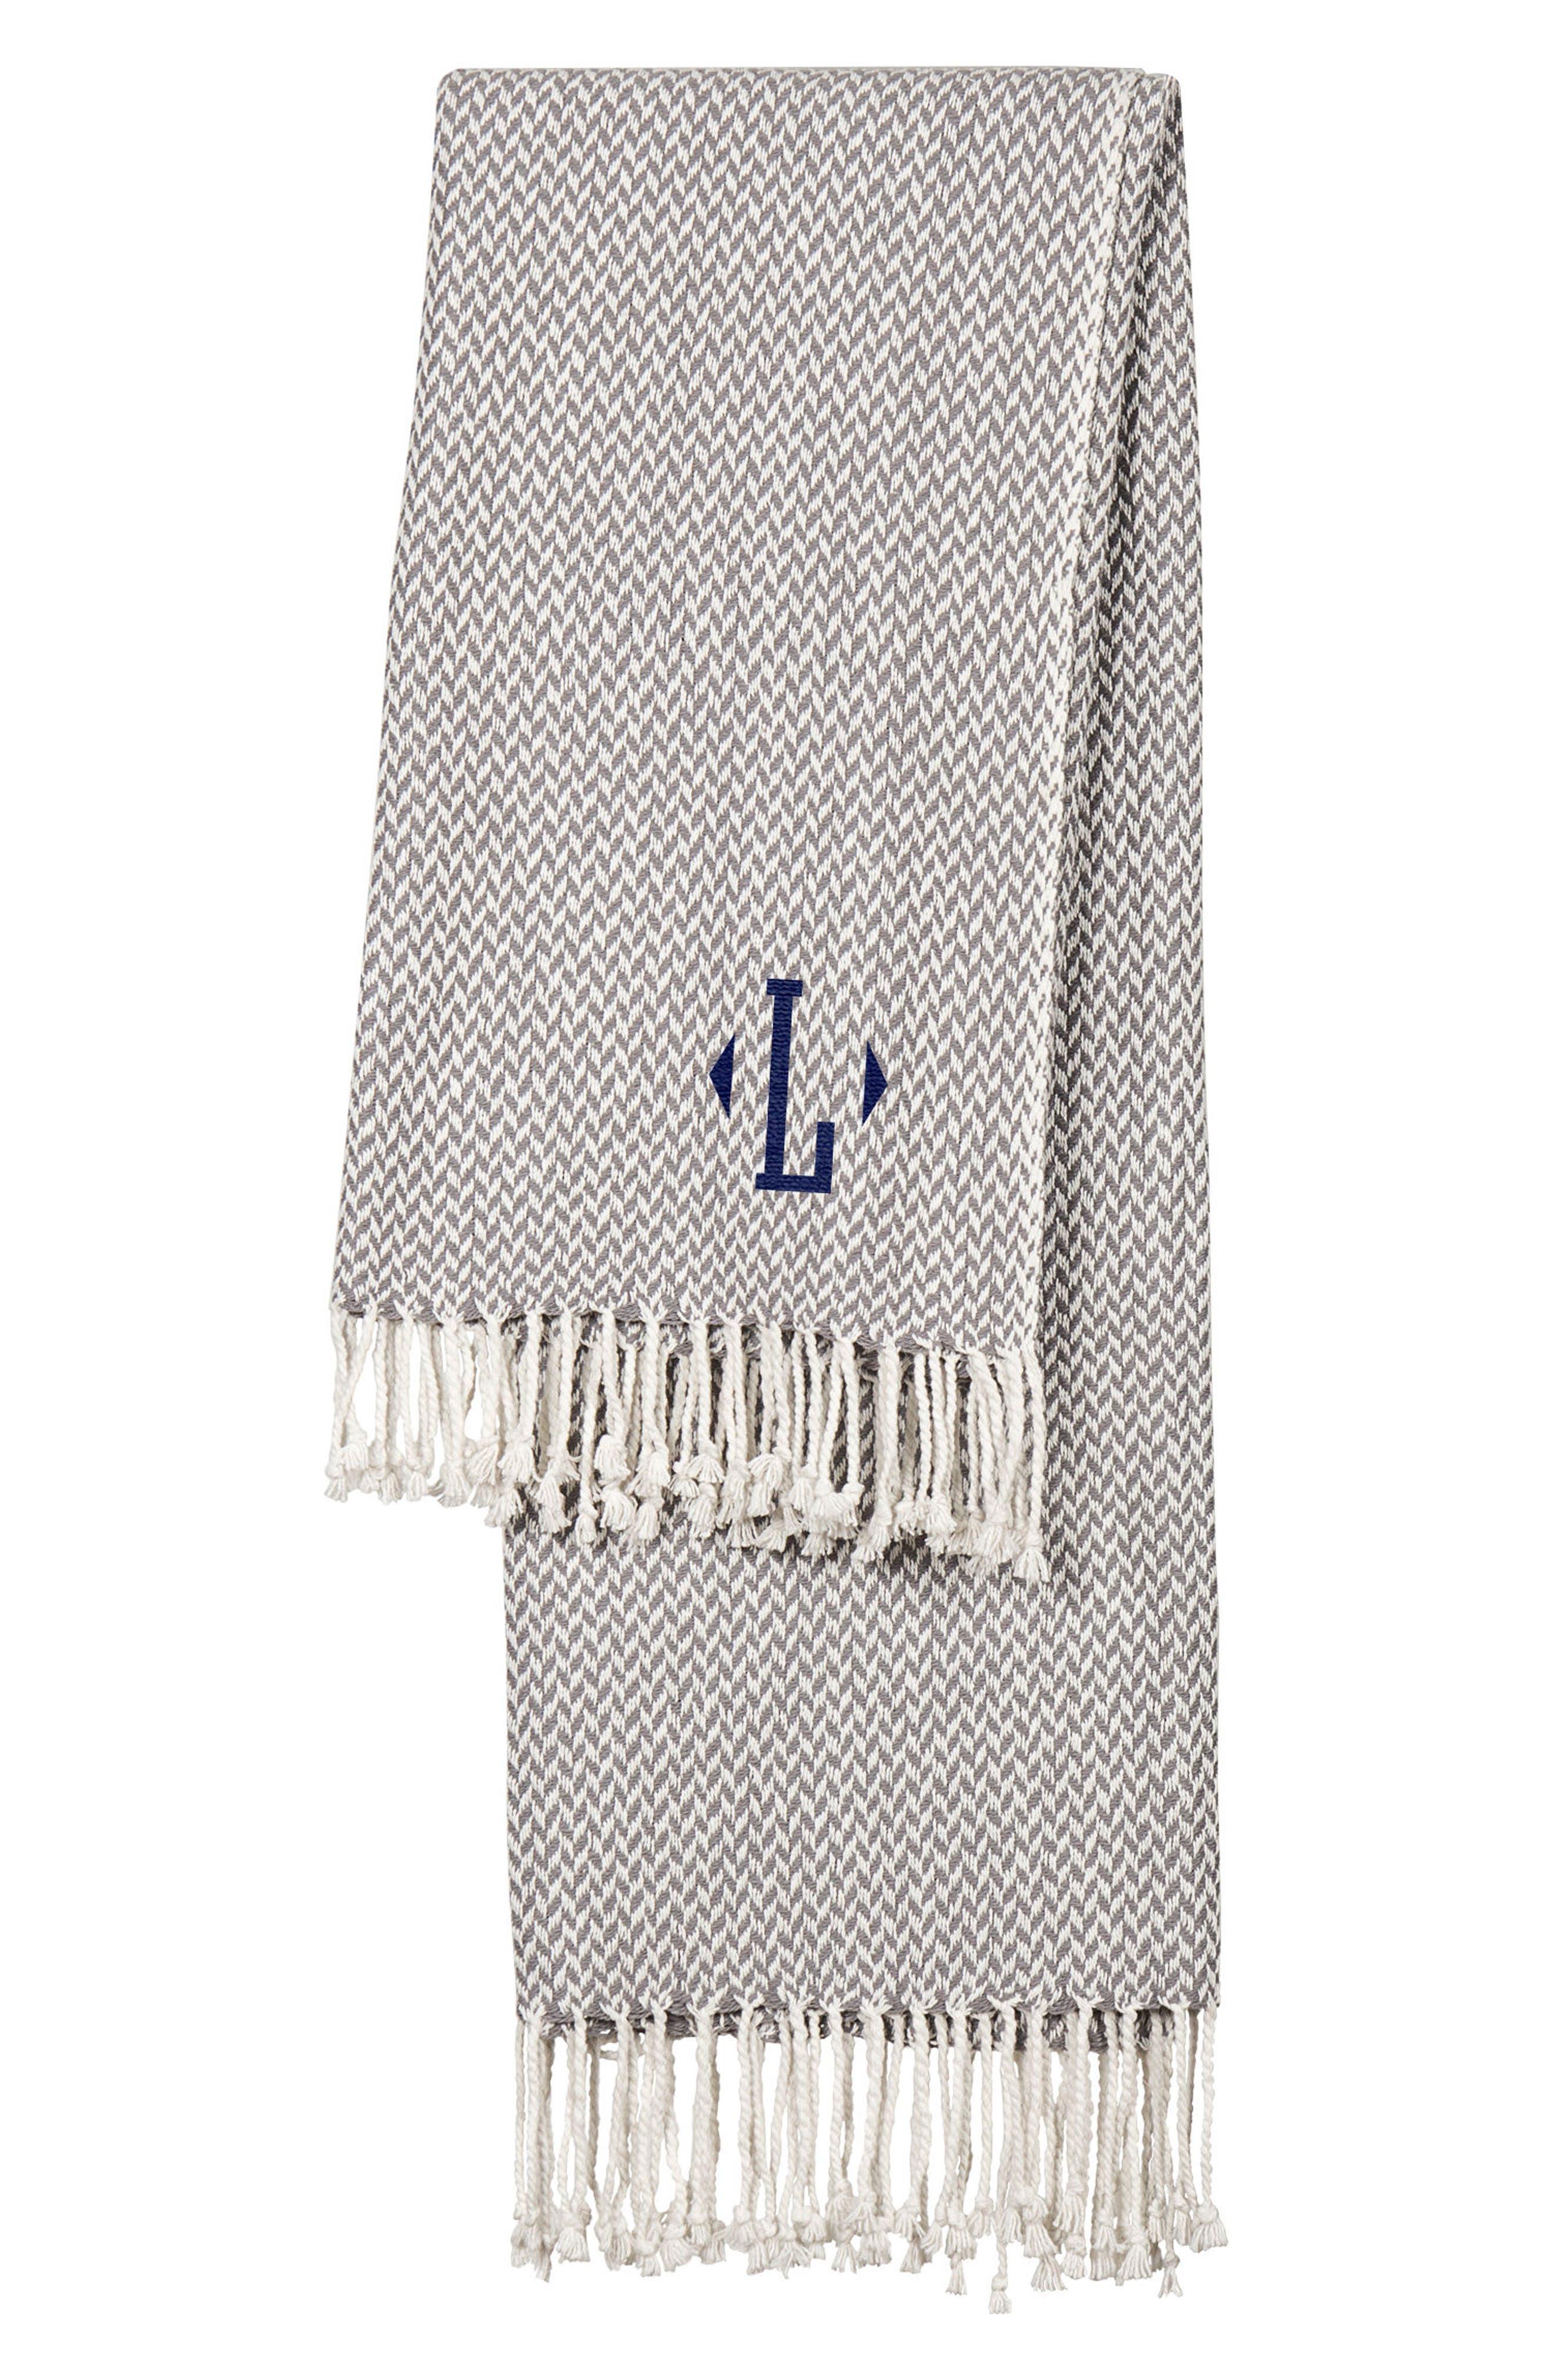 cathyu0027s concepts monogram herringbone throw blanket